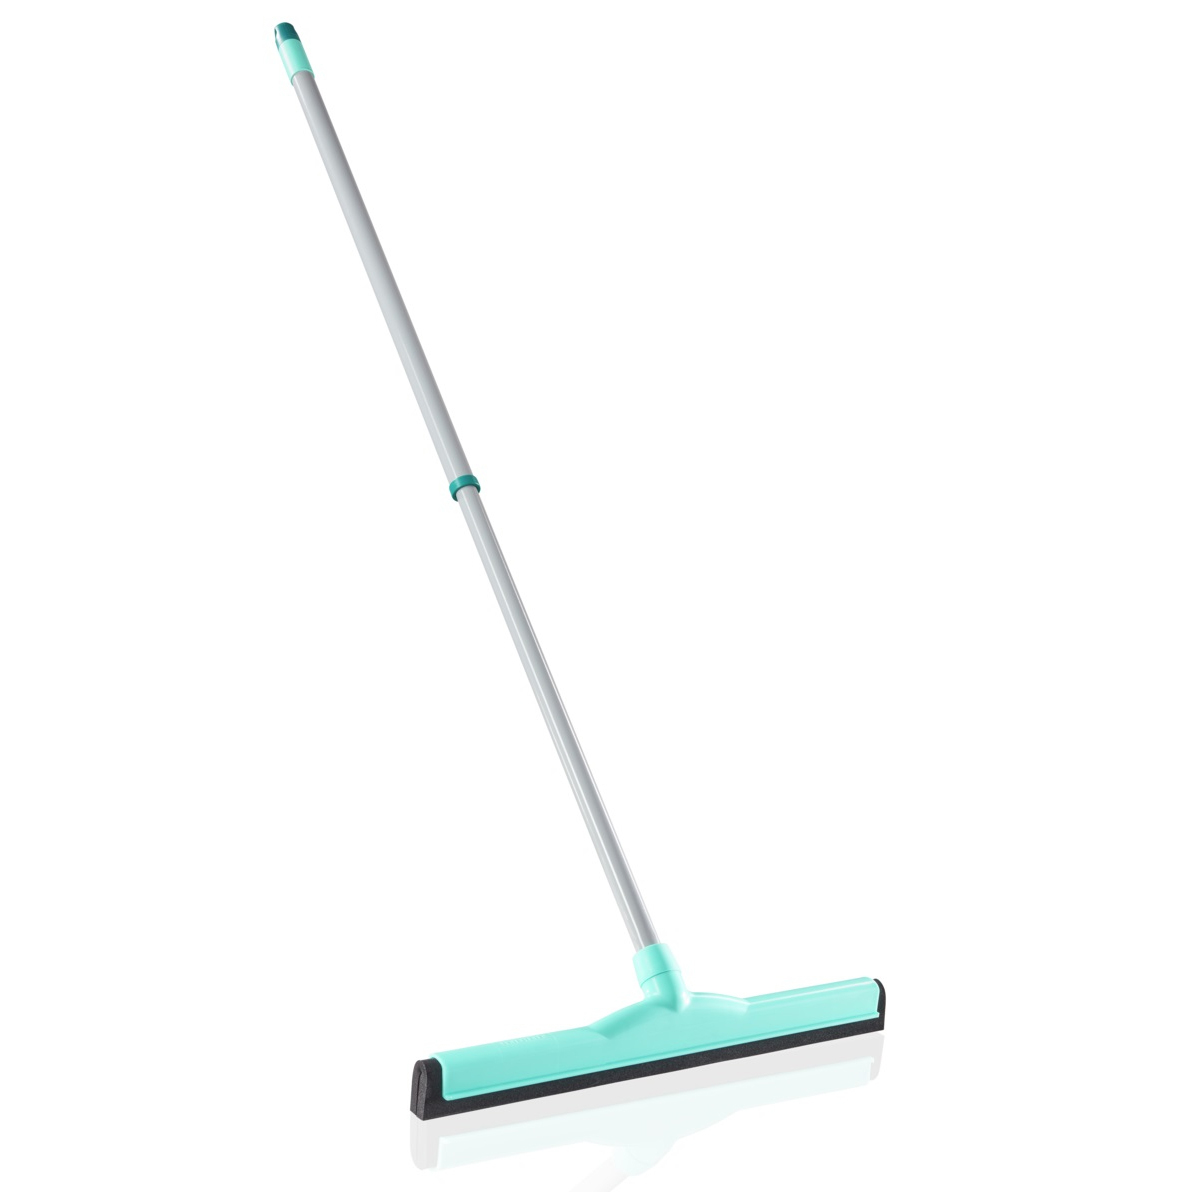 LEIFHEIT Pěnová stěrka na podlahu Classic 45 cm s teleskopickou tyčí LEIFHEIT 56421